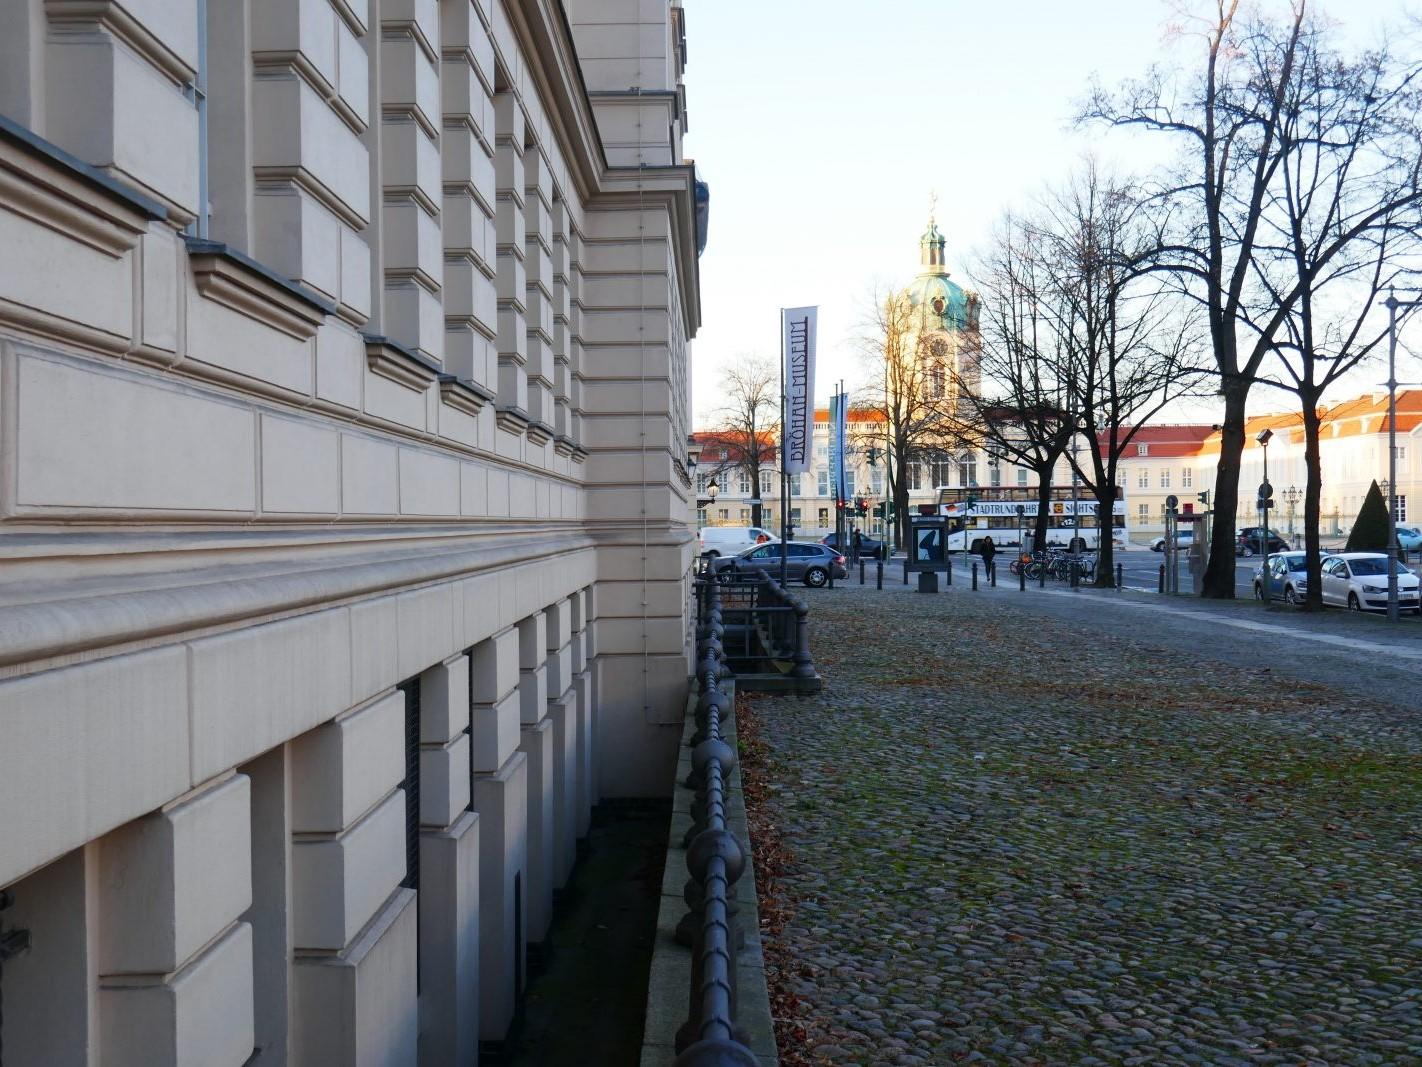 Berlin: Bröhan-Museum - mit Blick auf das Charlottenburger Schloss - Foto: Stefan Rethfeld